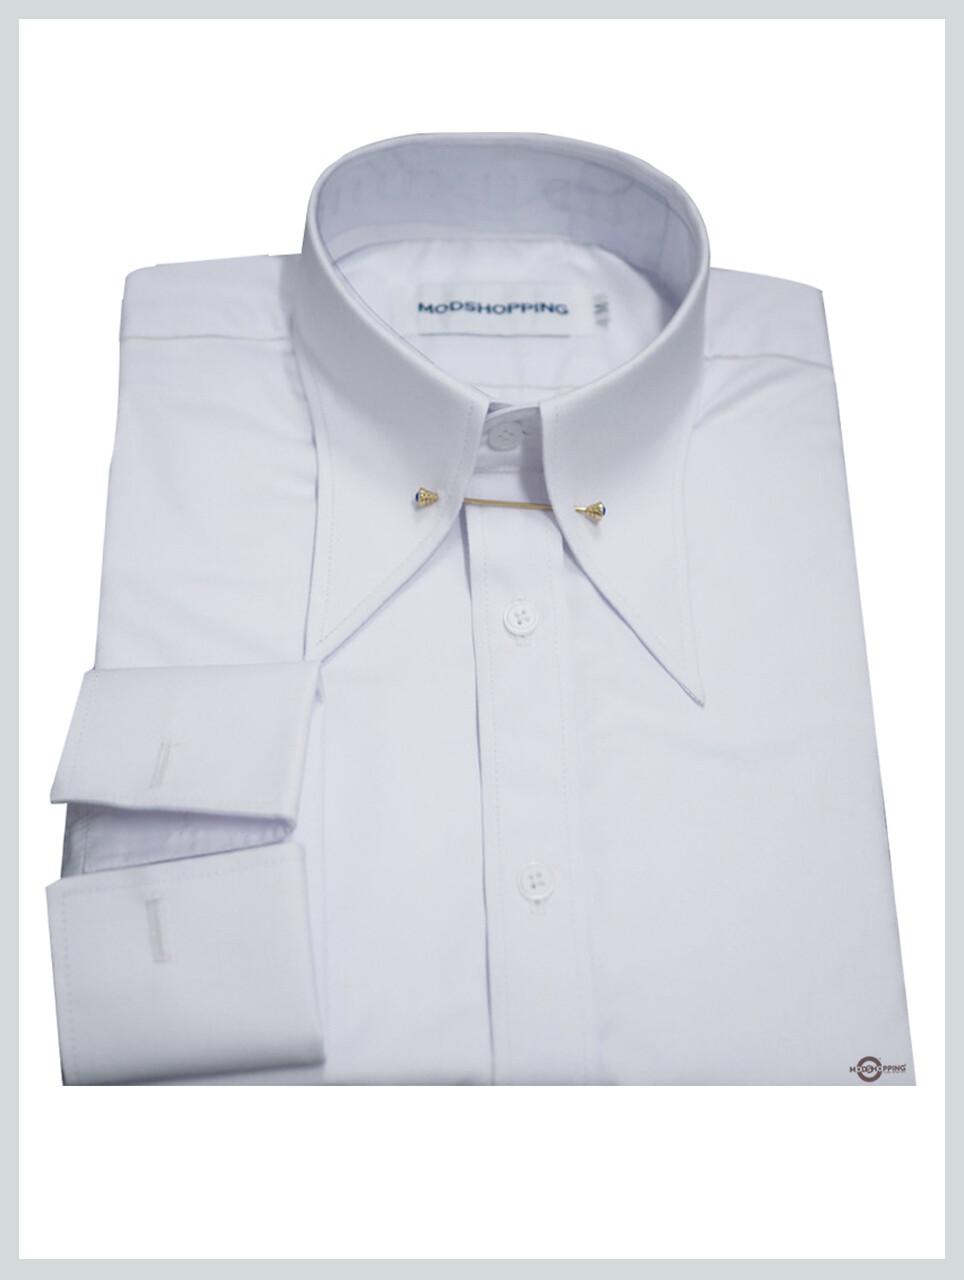 Spearpoint Pin Long Collar Vintage White Shirt